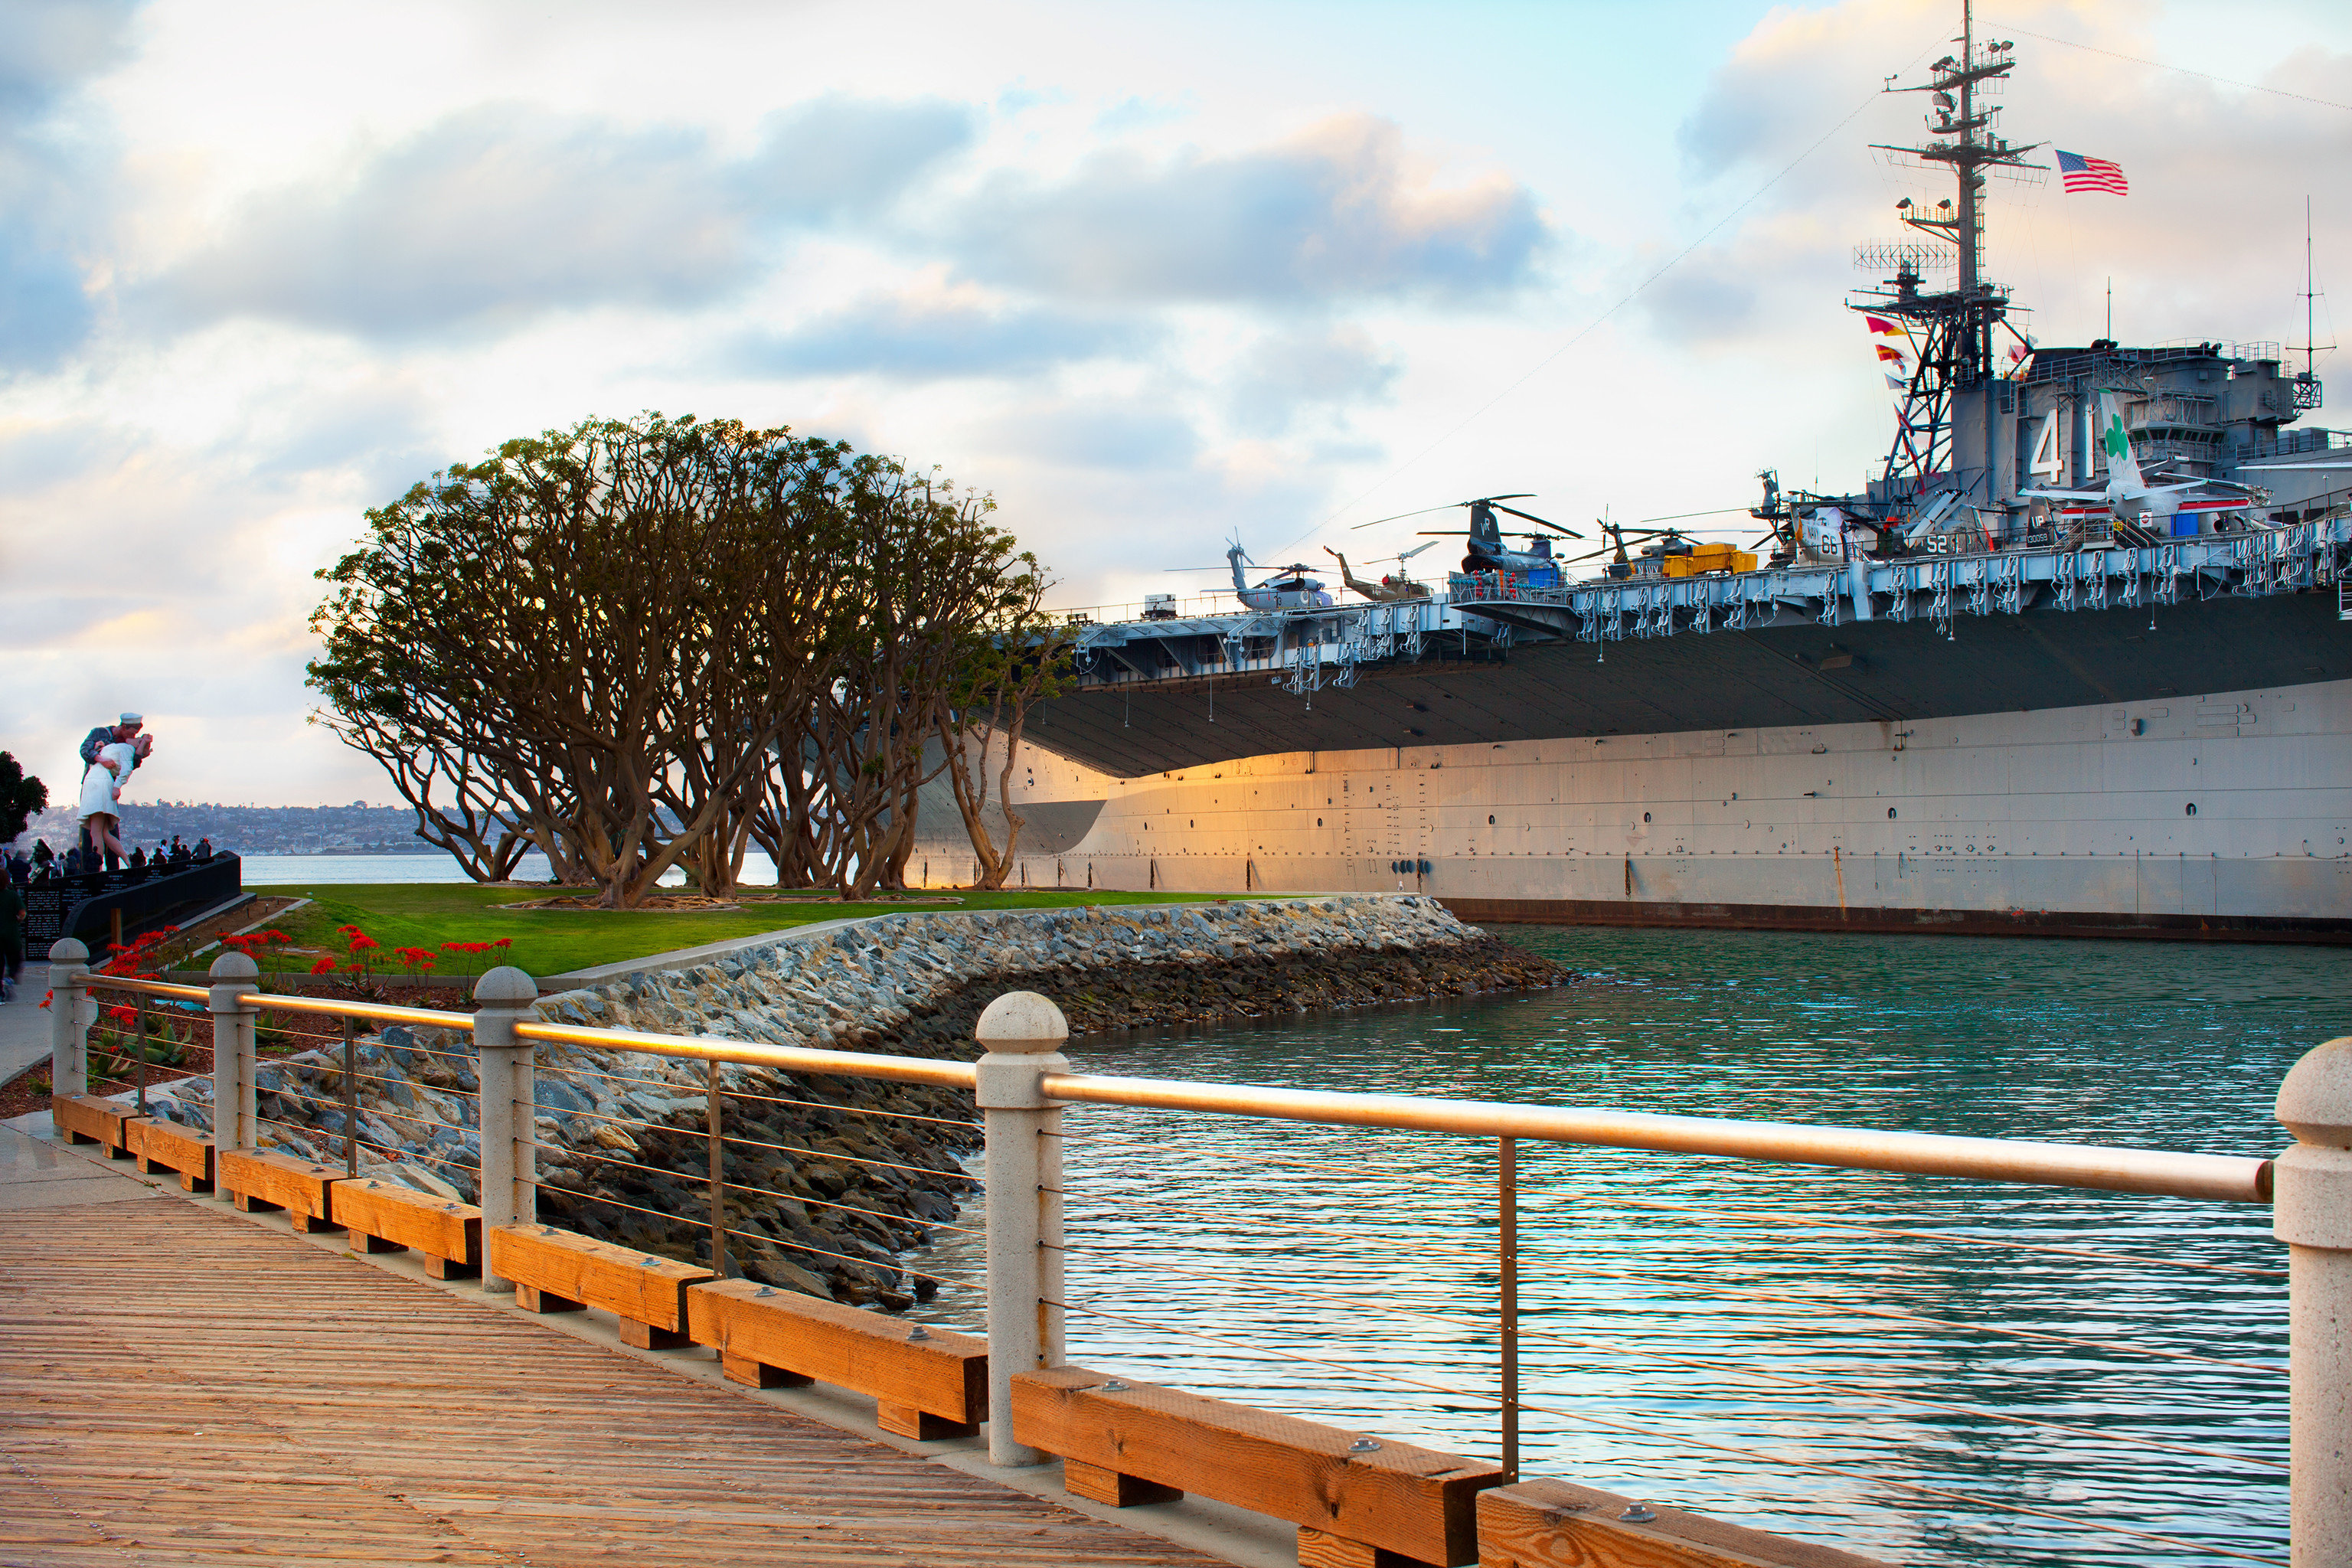 sky Boat vehicle ship pier dock Sea watercraft waterway docked